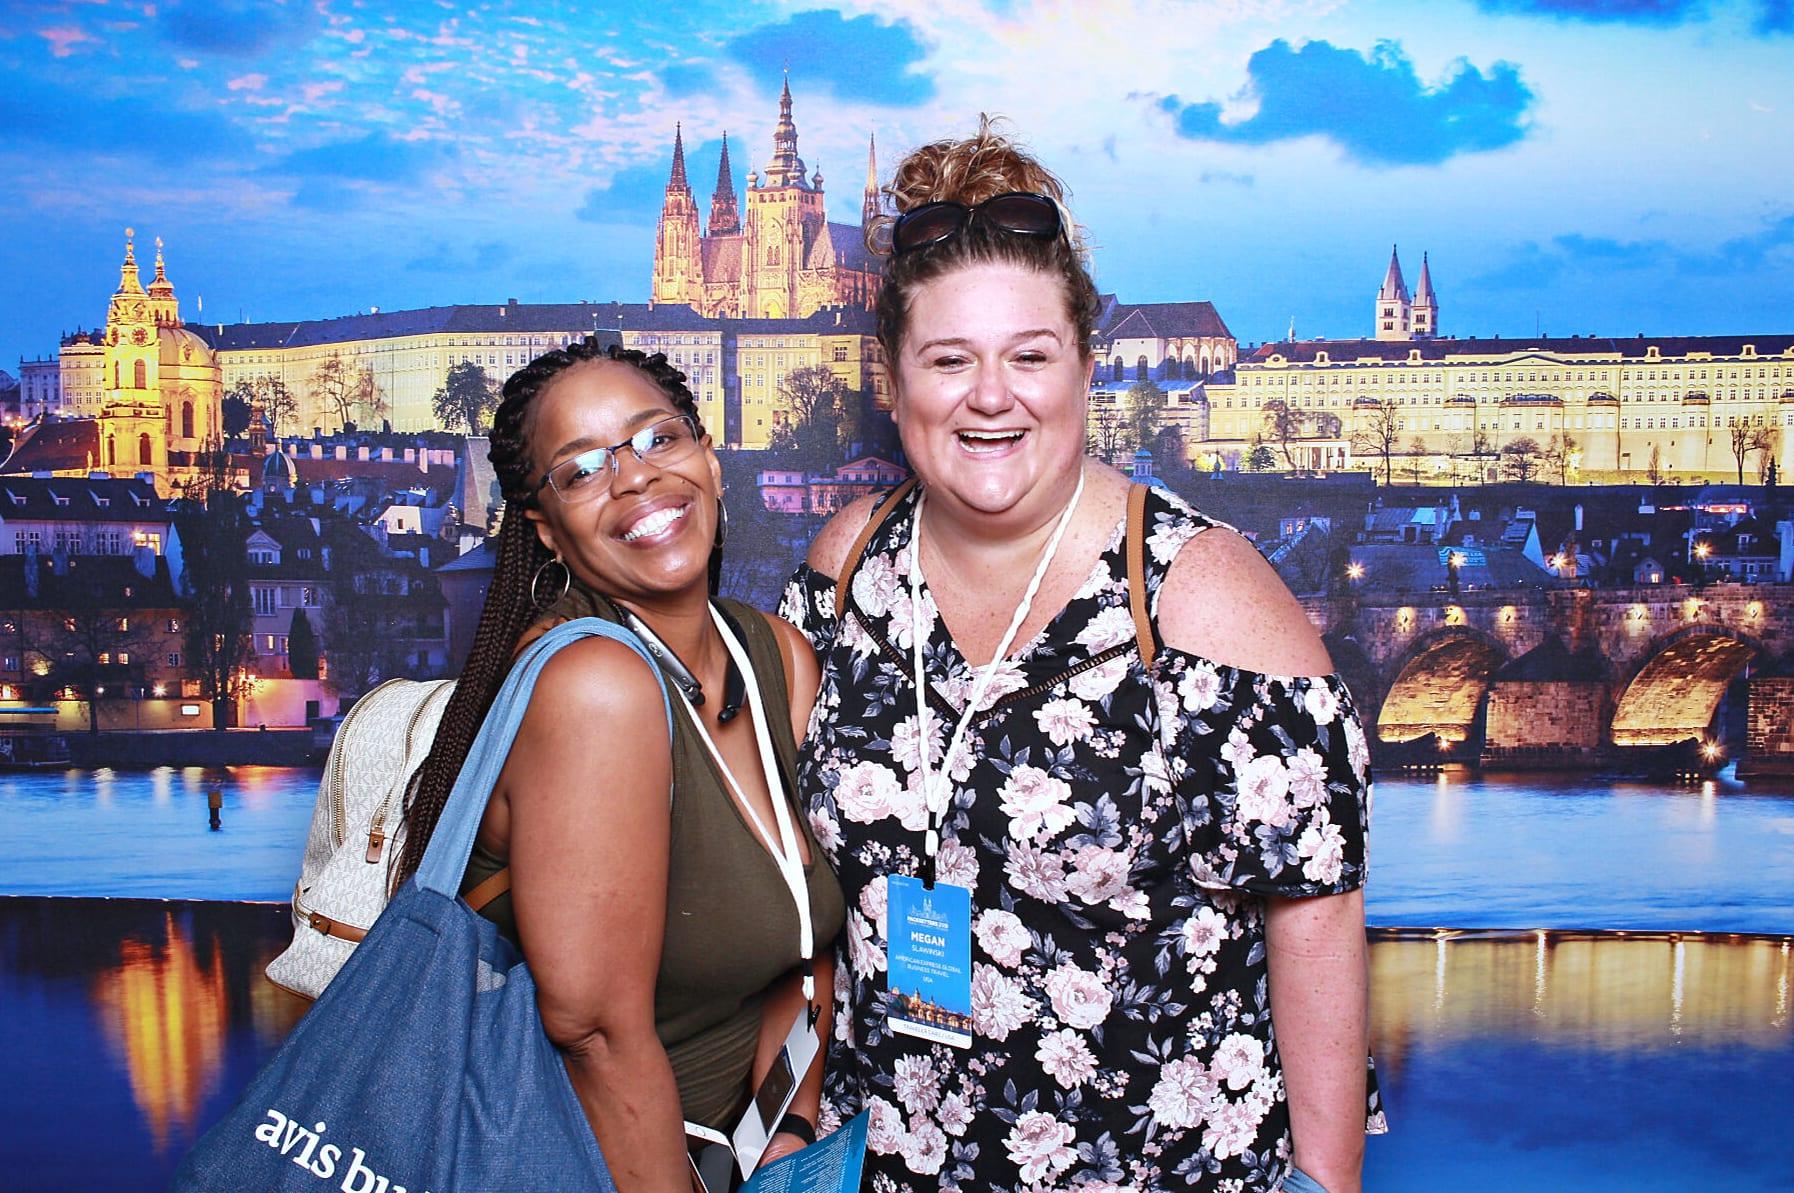 fotokoutek-konference-praha-enterprise-2-12-6-2019-623828